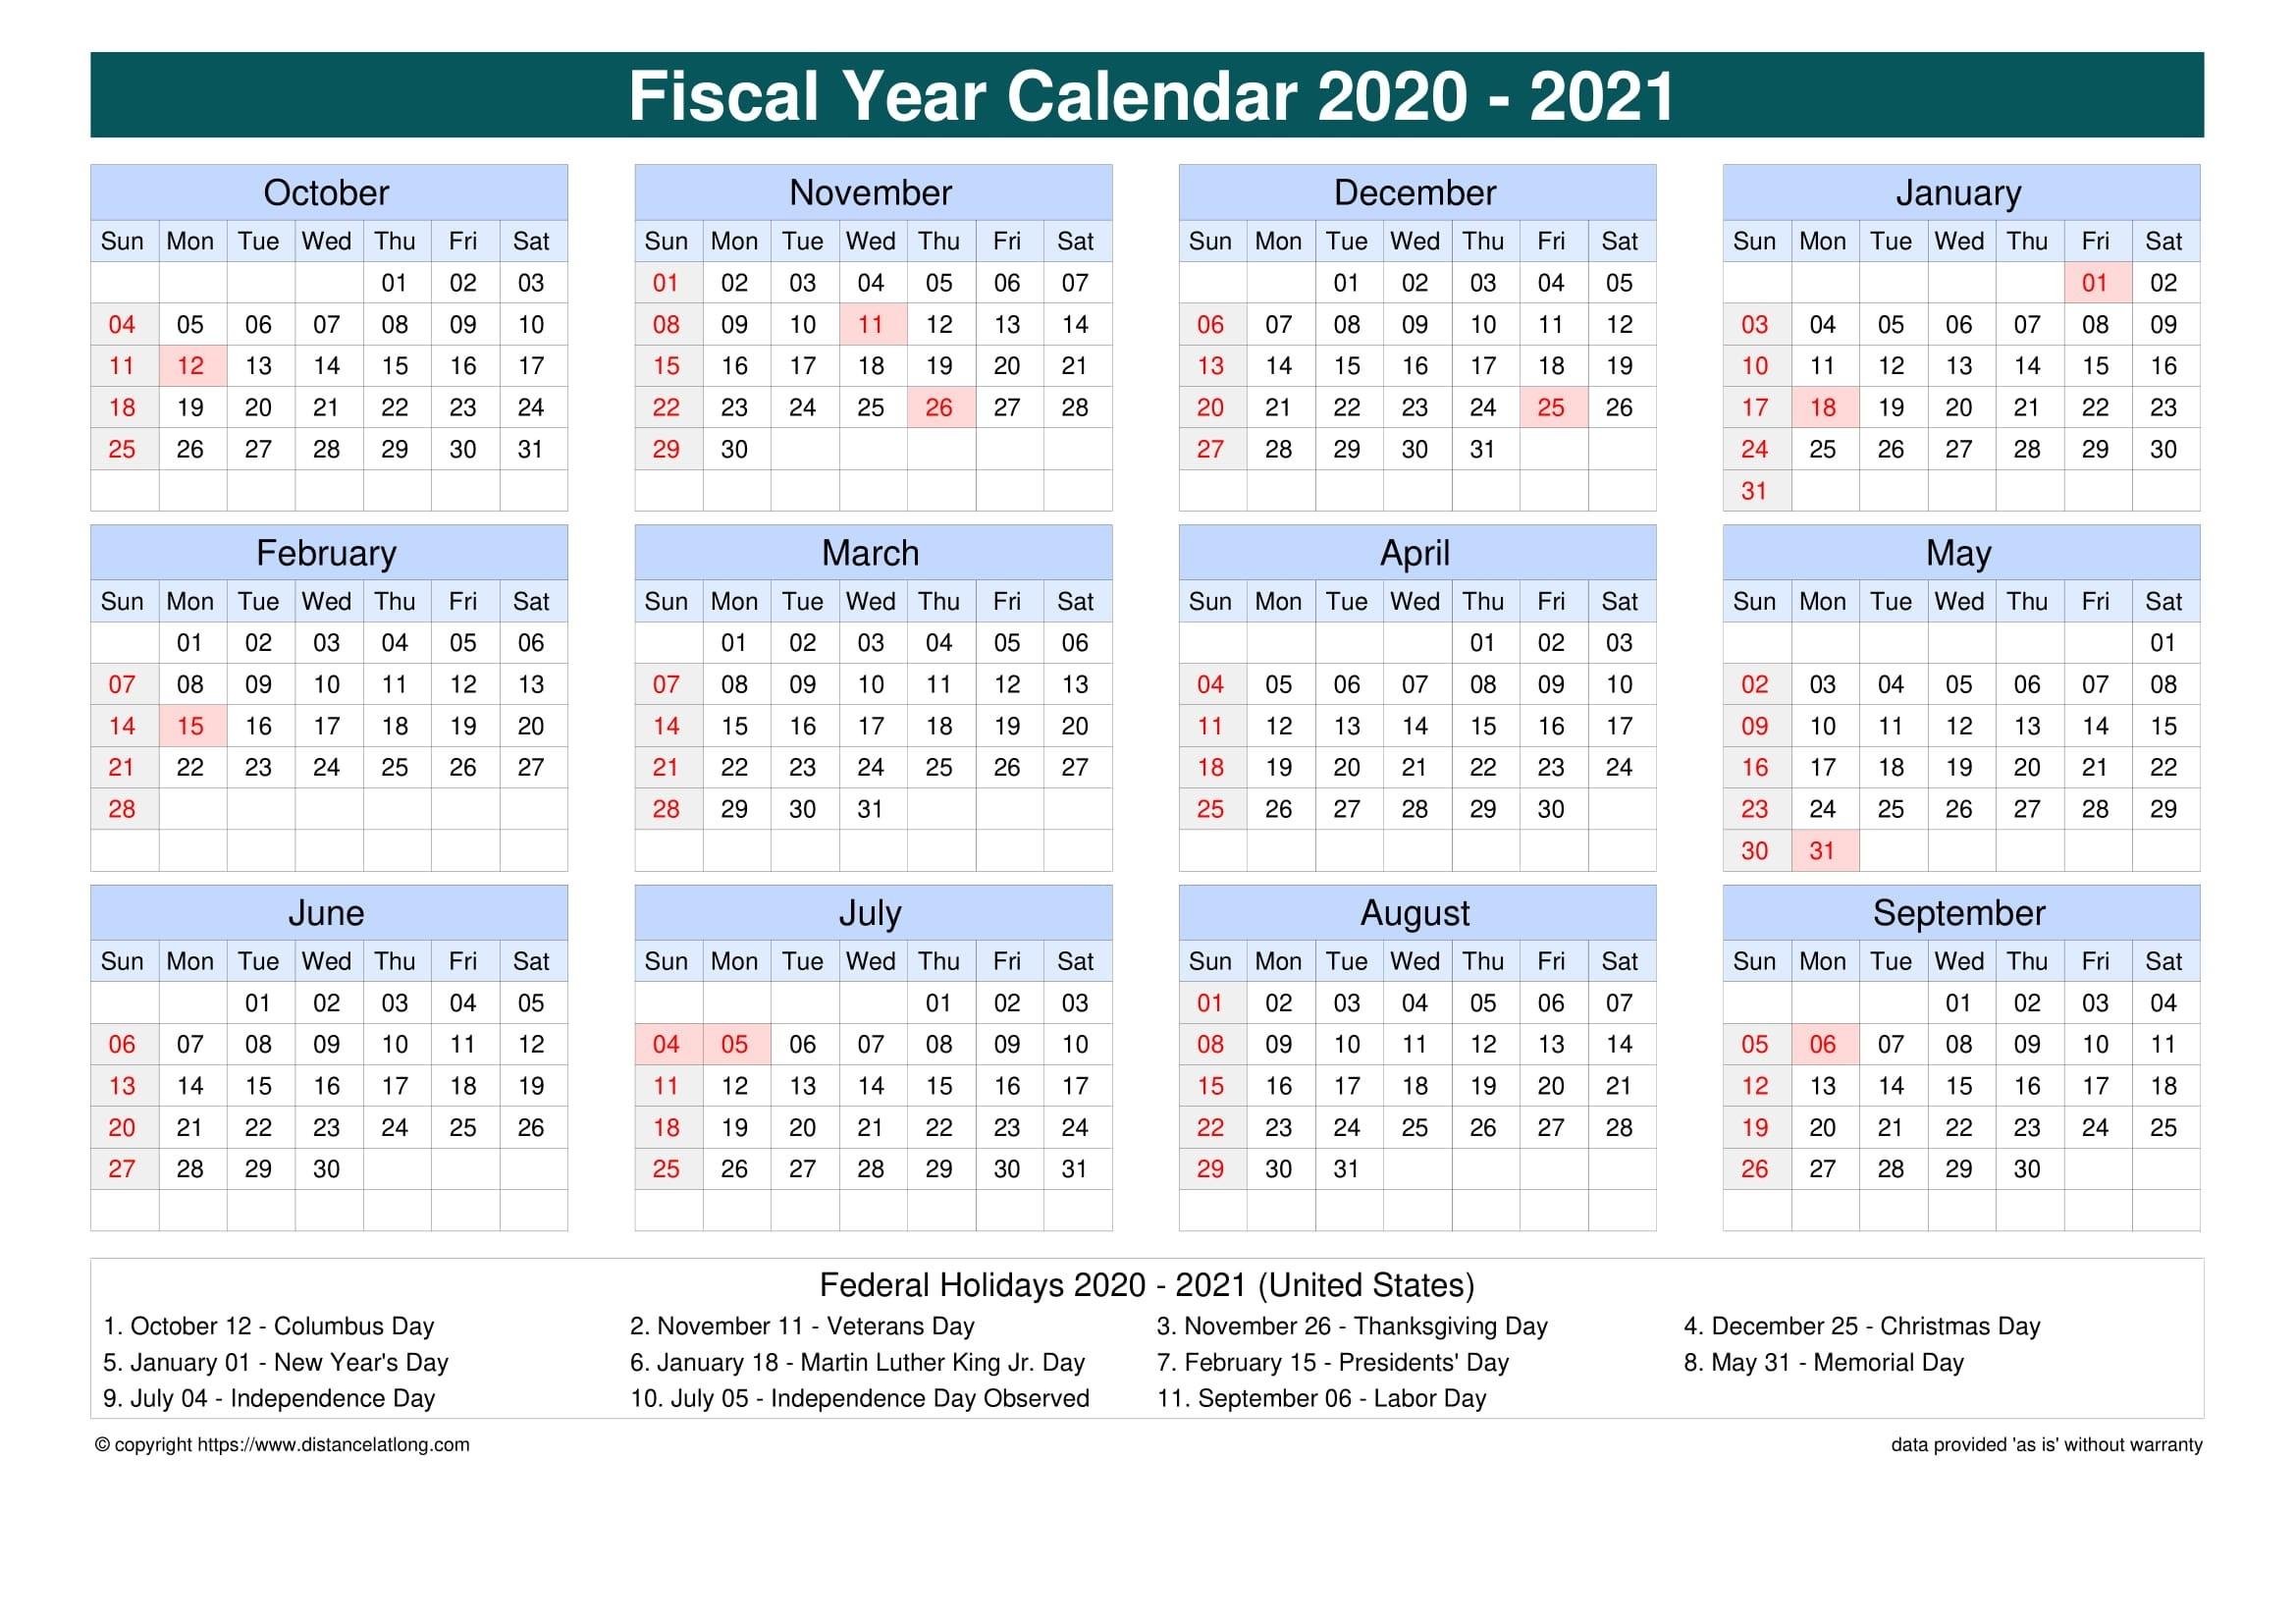 Fiscal Year 2020-2021 Calendar Templates, Free Printable  Printable Fiscal Year Calendar 2021 2021